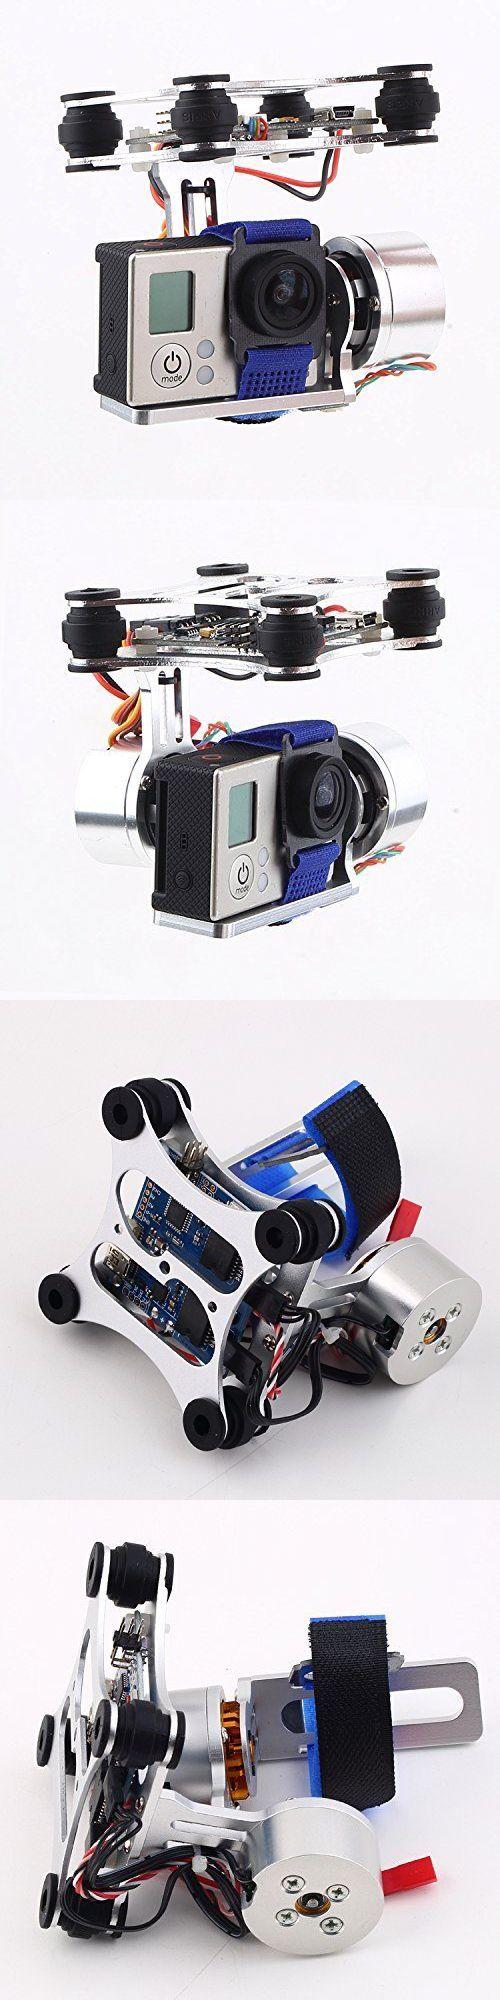 Radio Control 51029: Dji Phantom Gopro 2 3 Cnc Metal Brushless Camera Gimbal W V2.3B5 Controller -> BUY IT NOW ONLY: $40.2 on eBay!